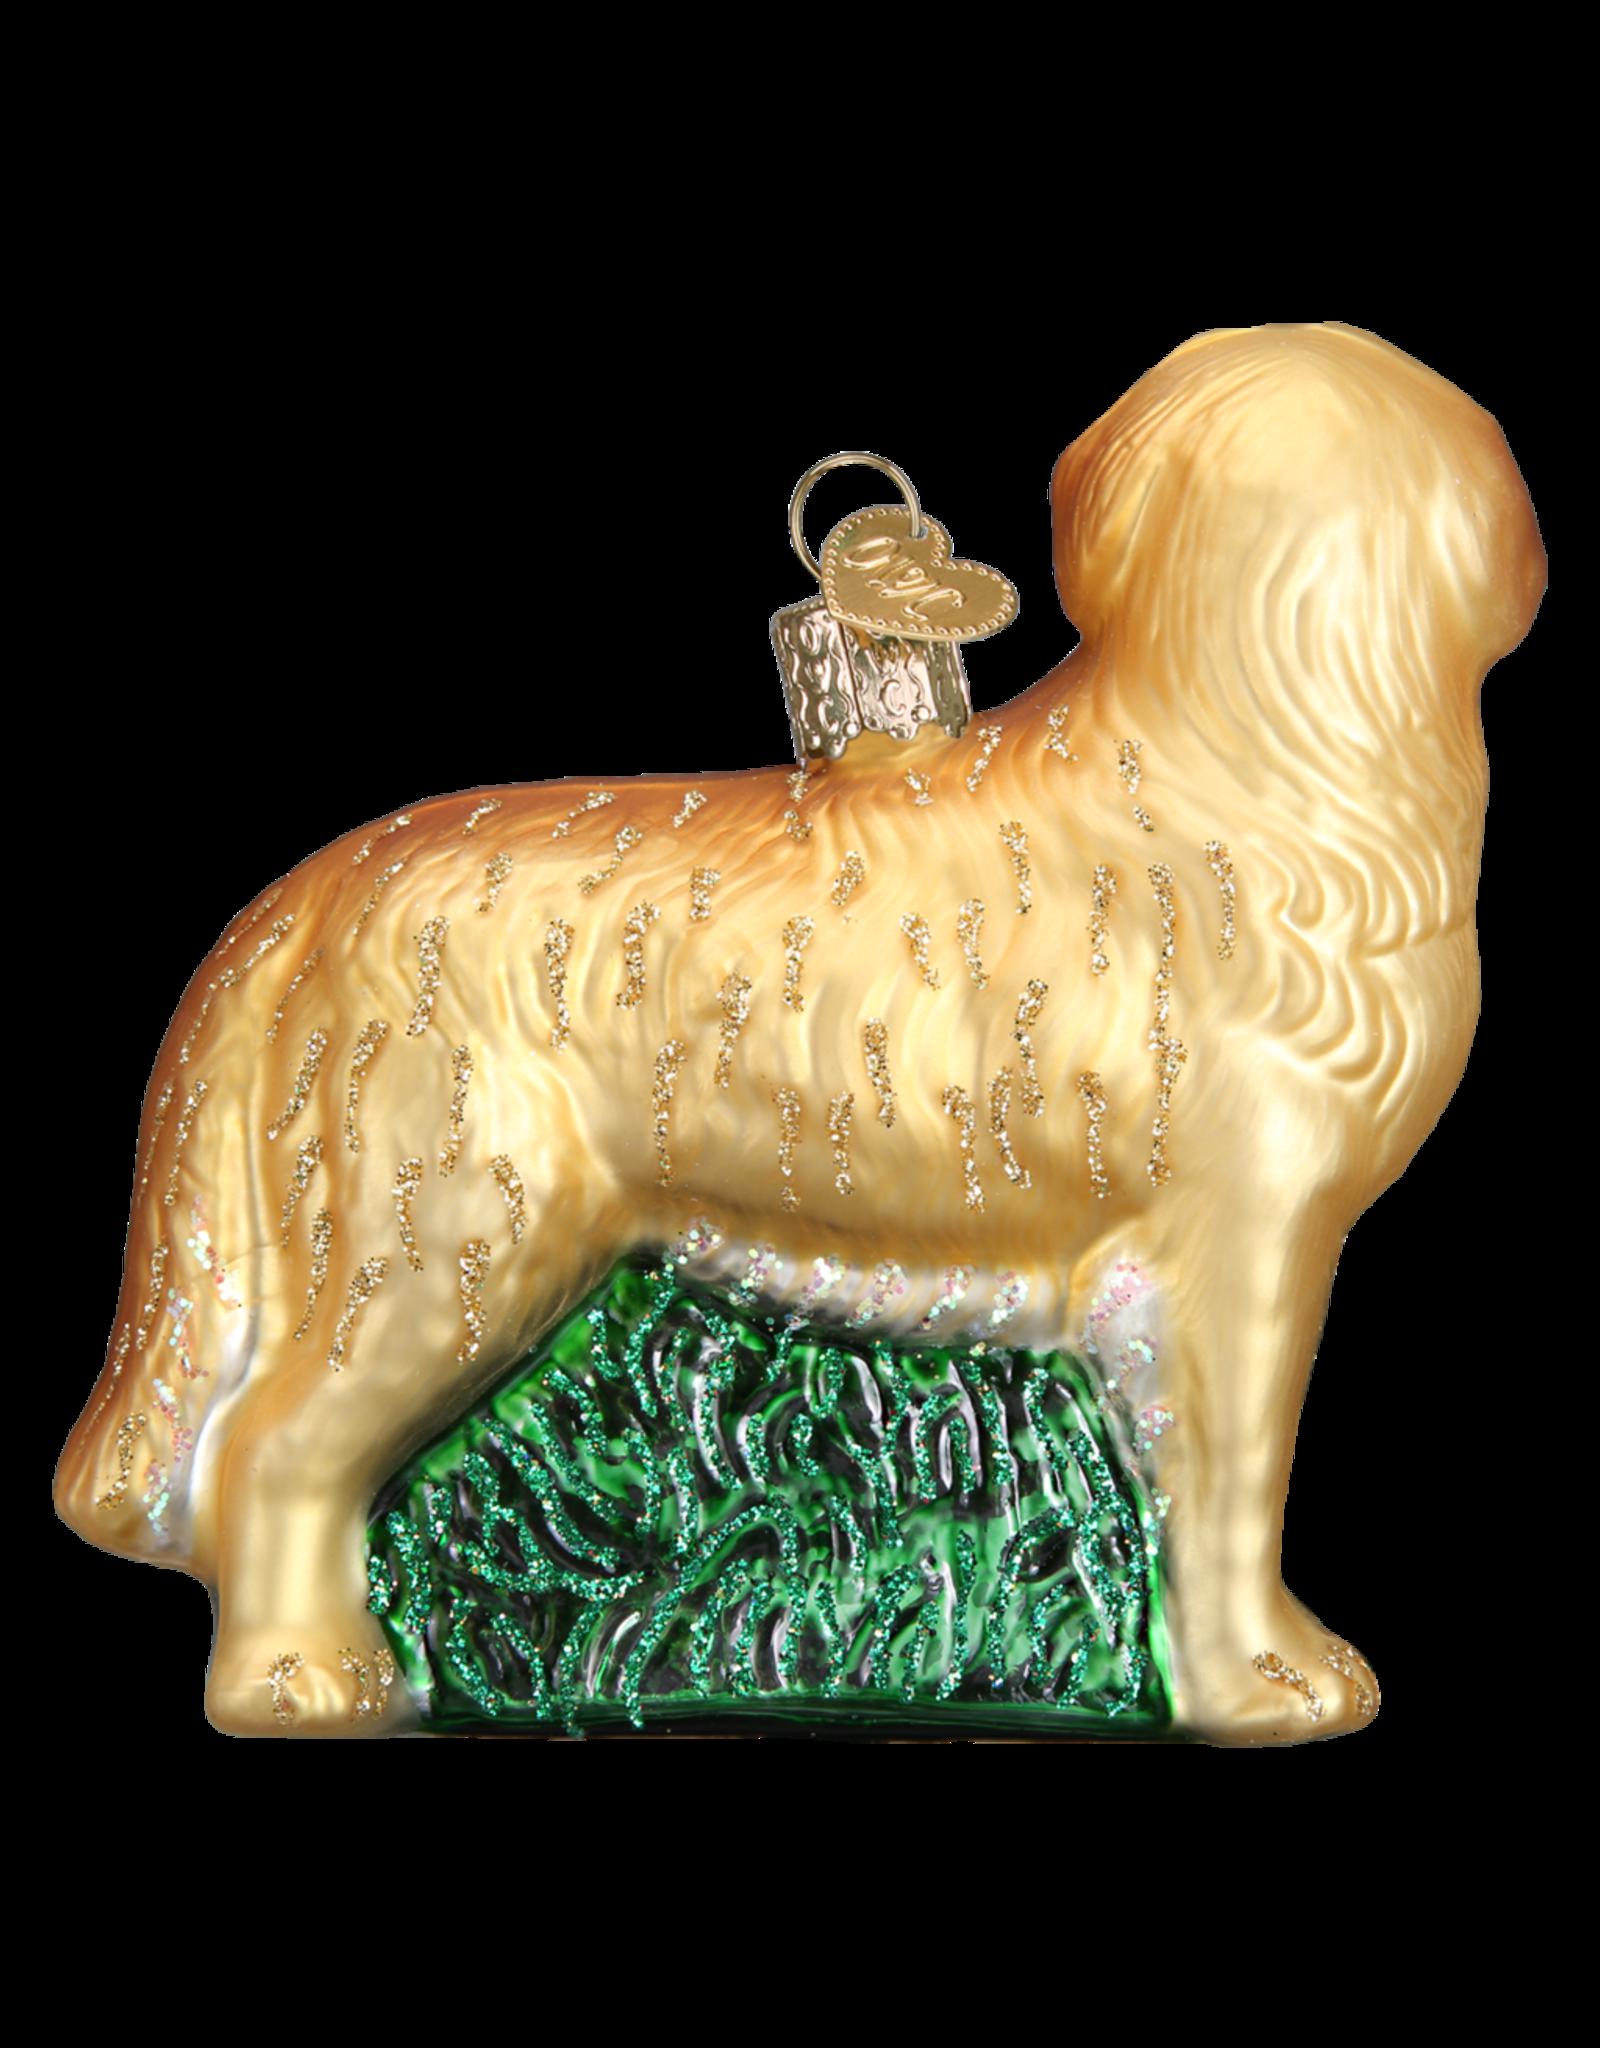 Old World Christmas Golden Retriever Ornament